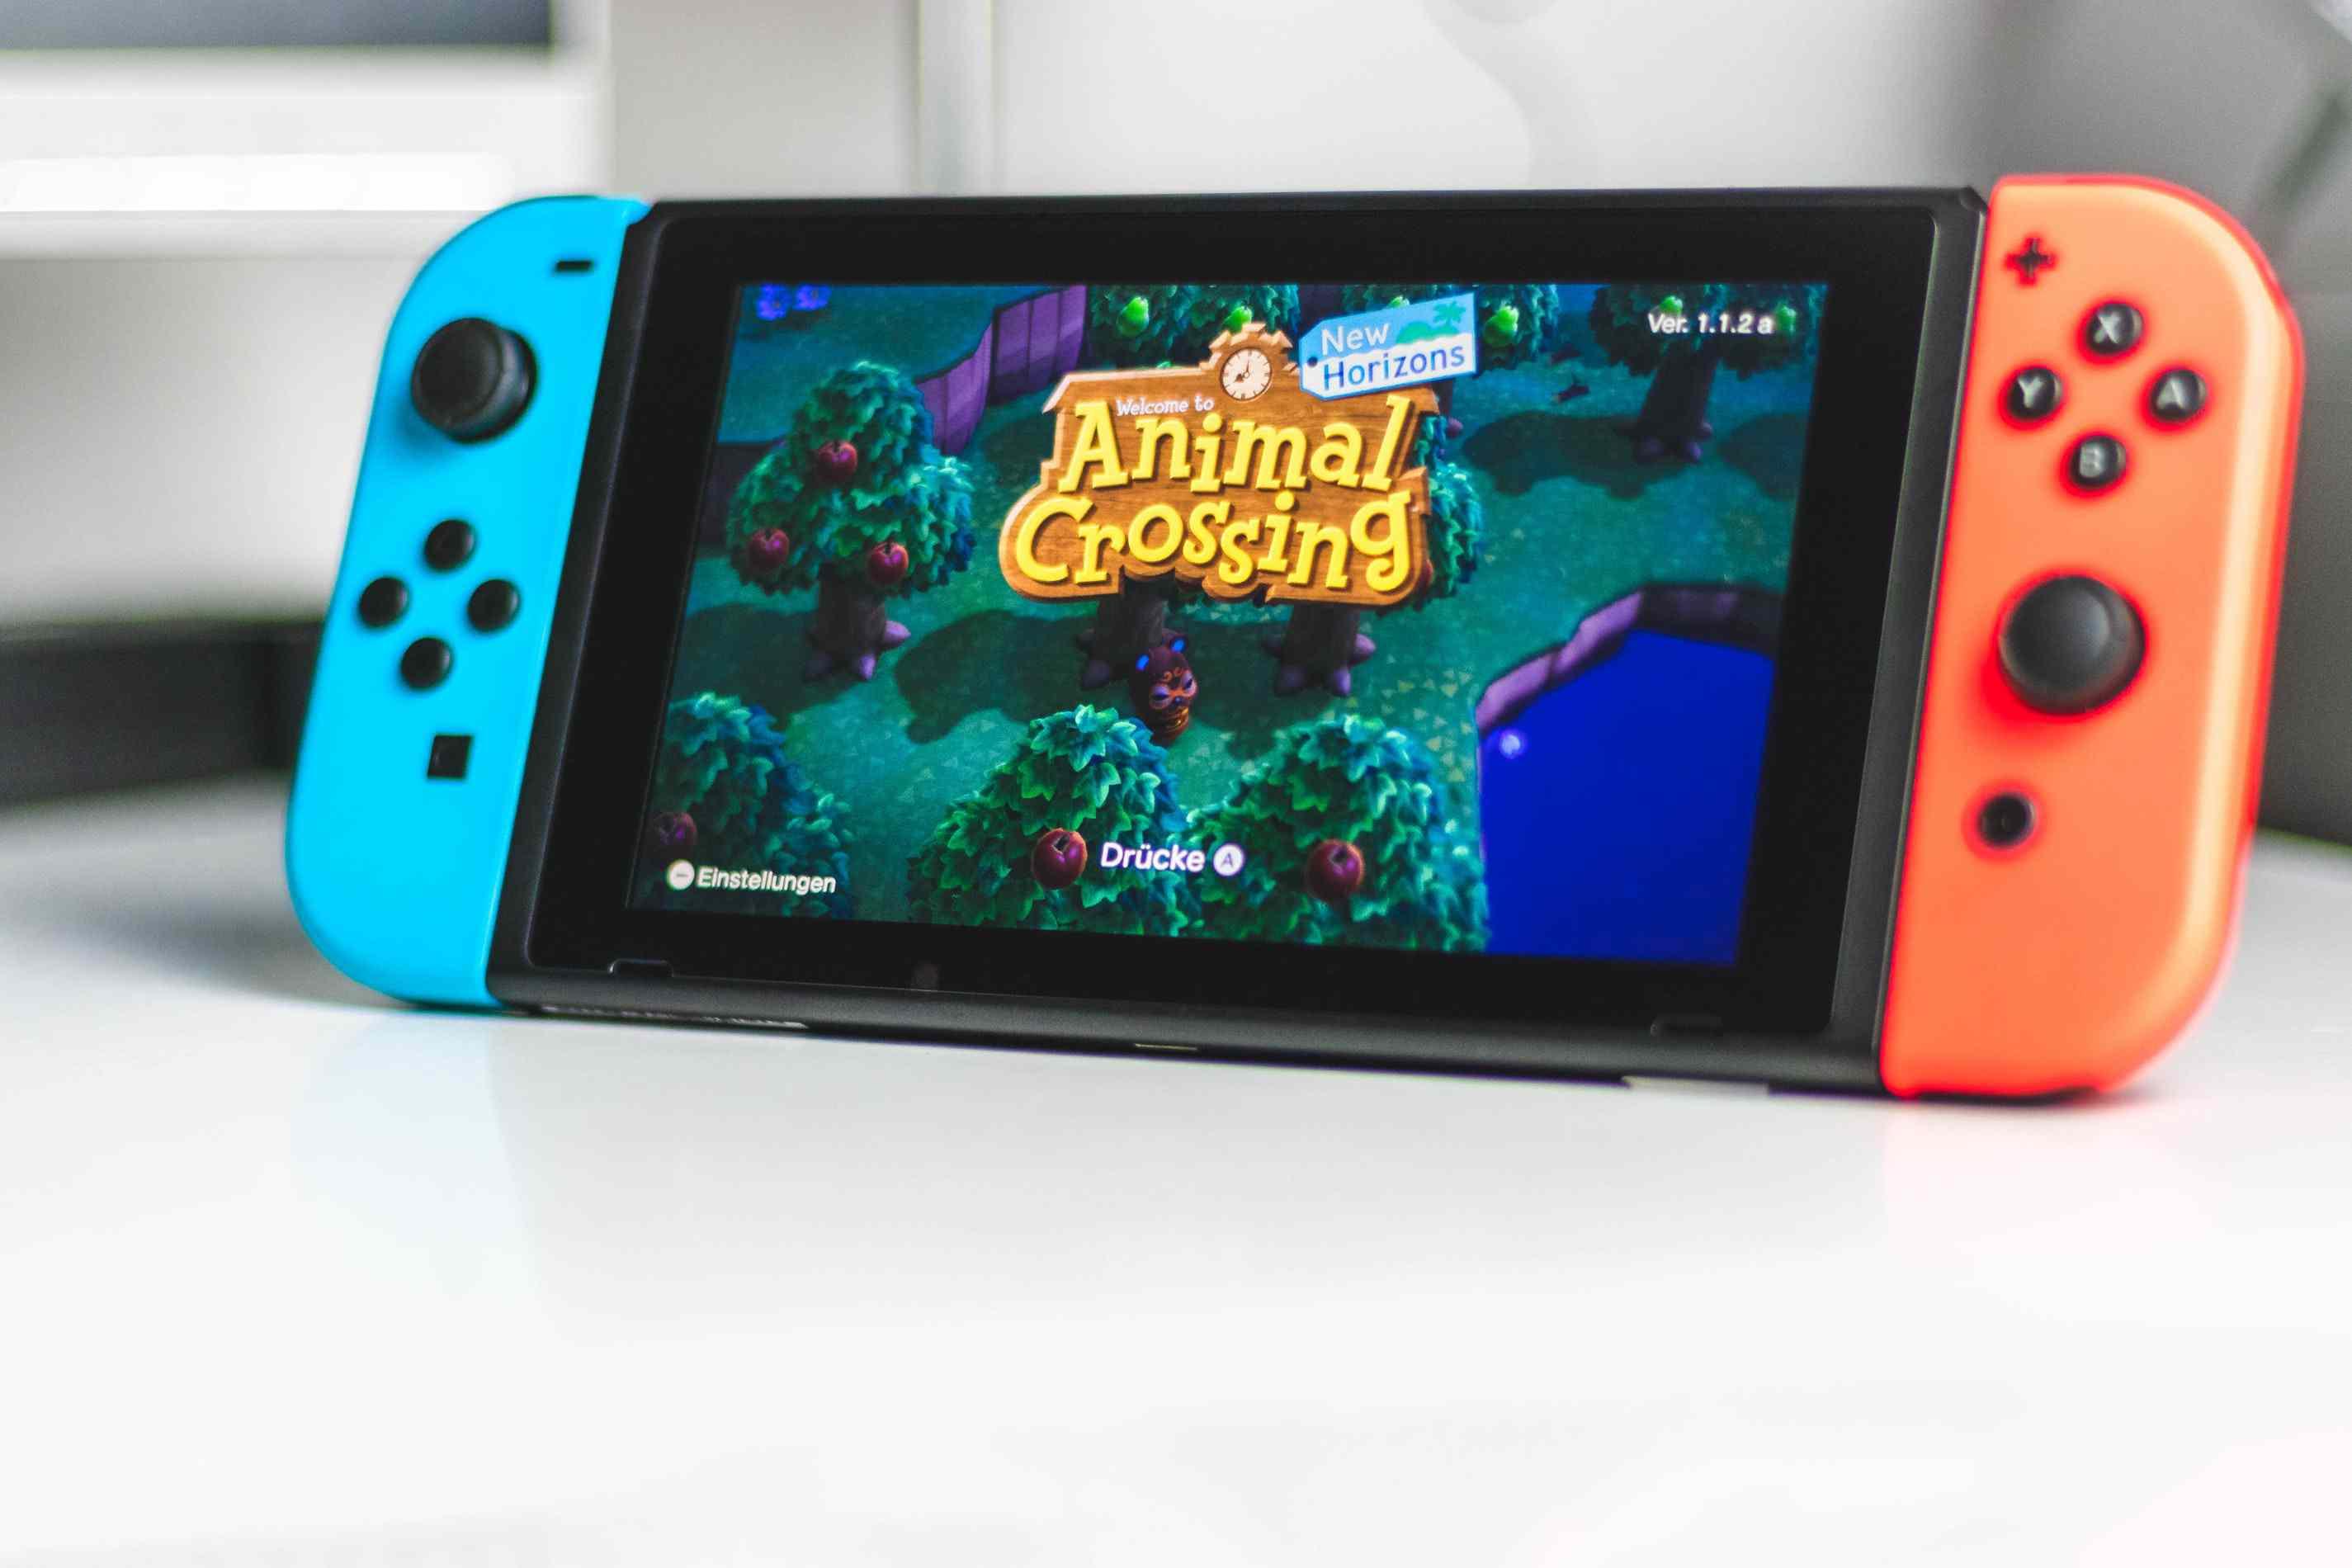 Nintendo Switch standing with kickstand and running Animal Crossing: New Horizons